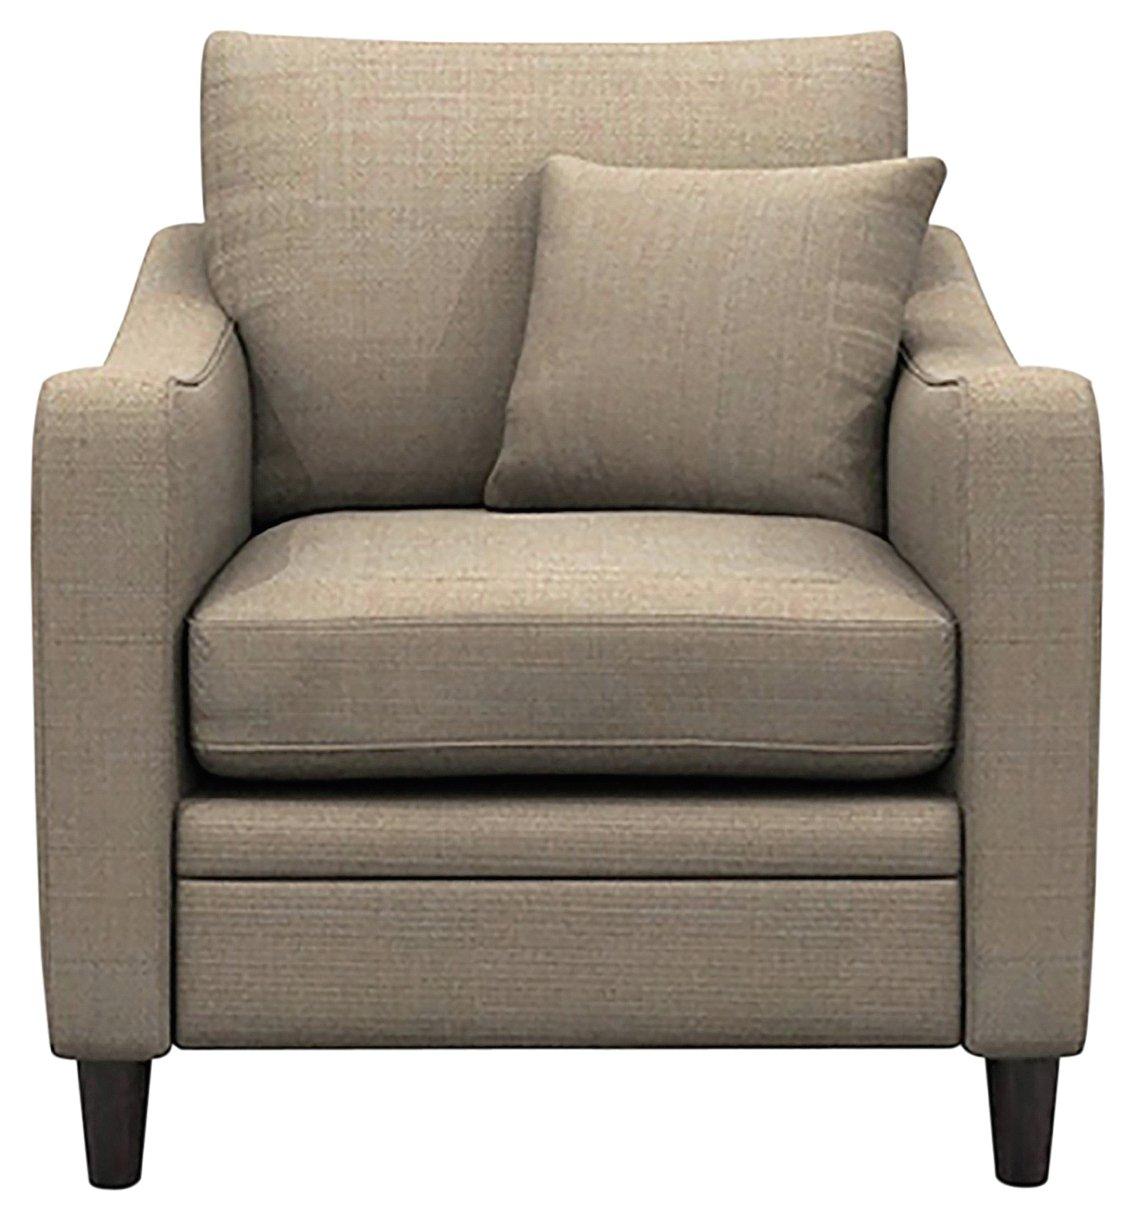 Heart of House Newbury Fabric Chair - Beige + Black Legs